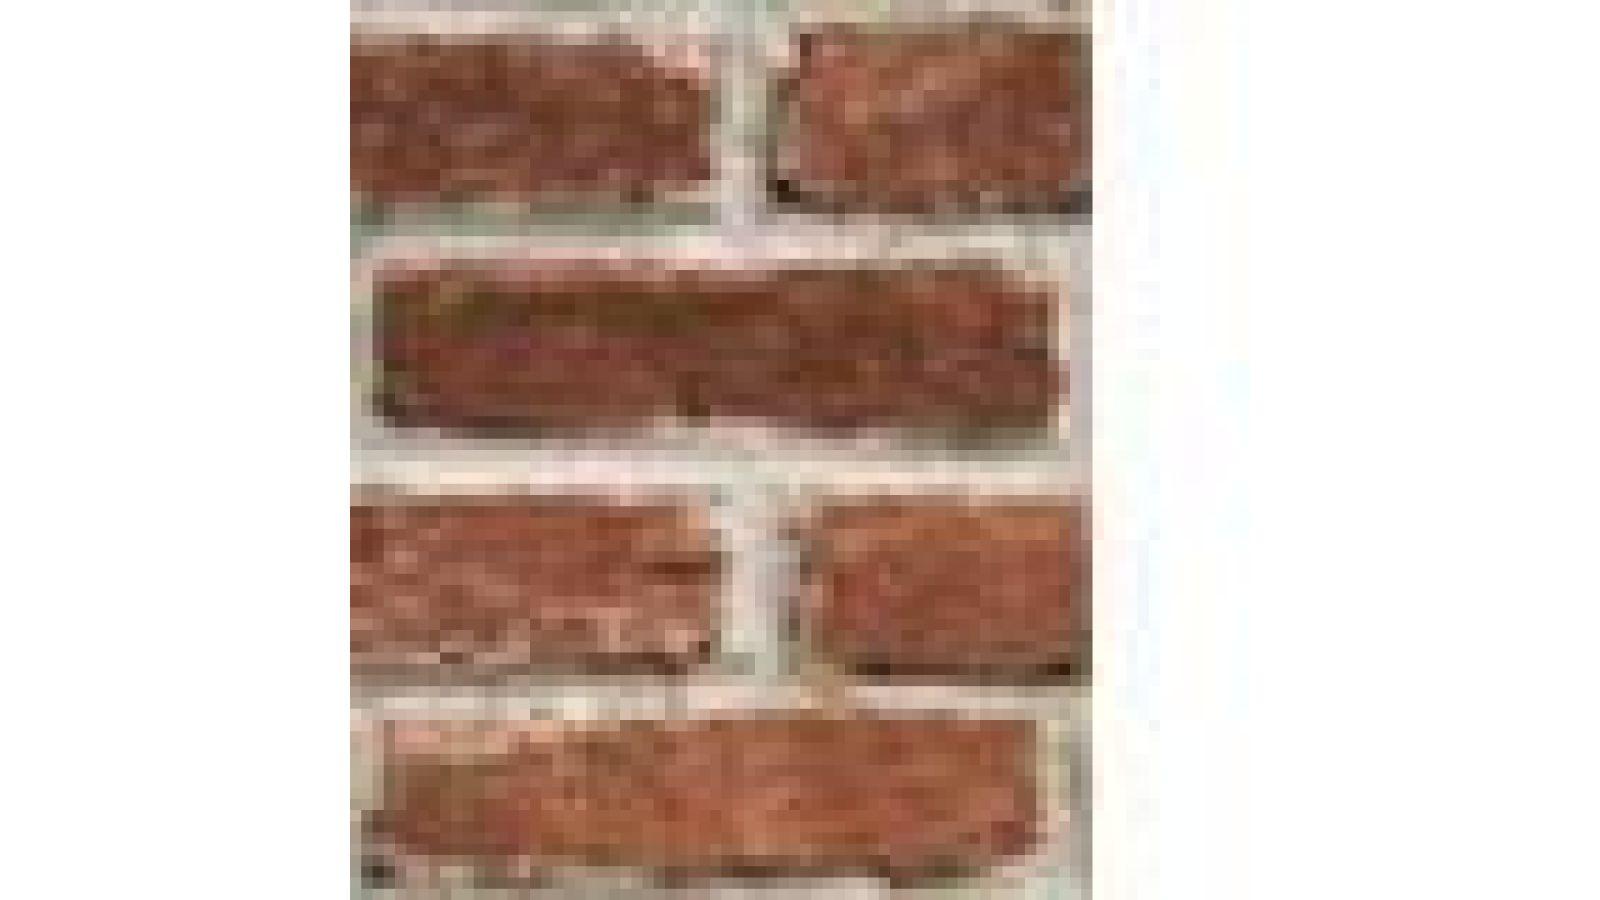 Weathered Brick